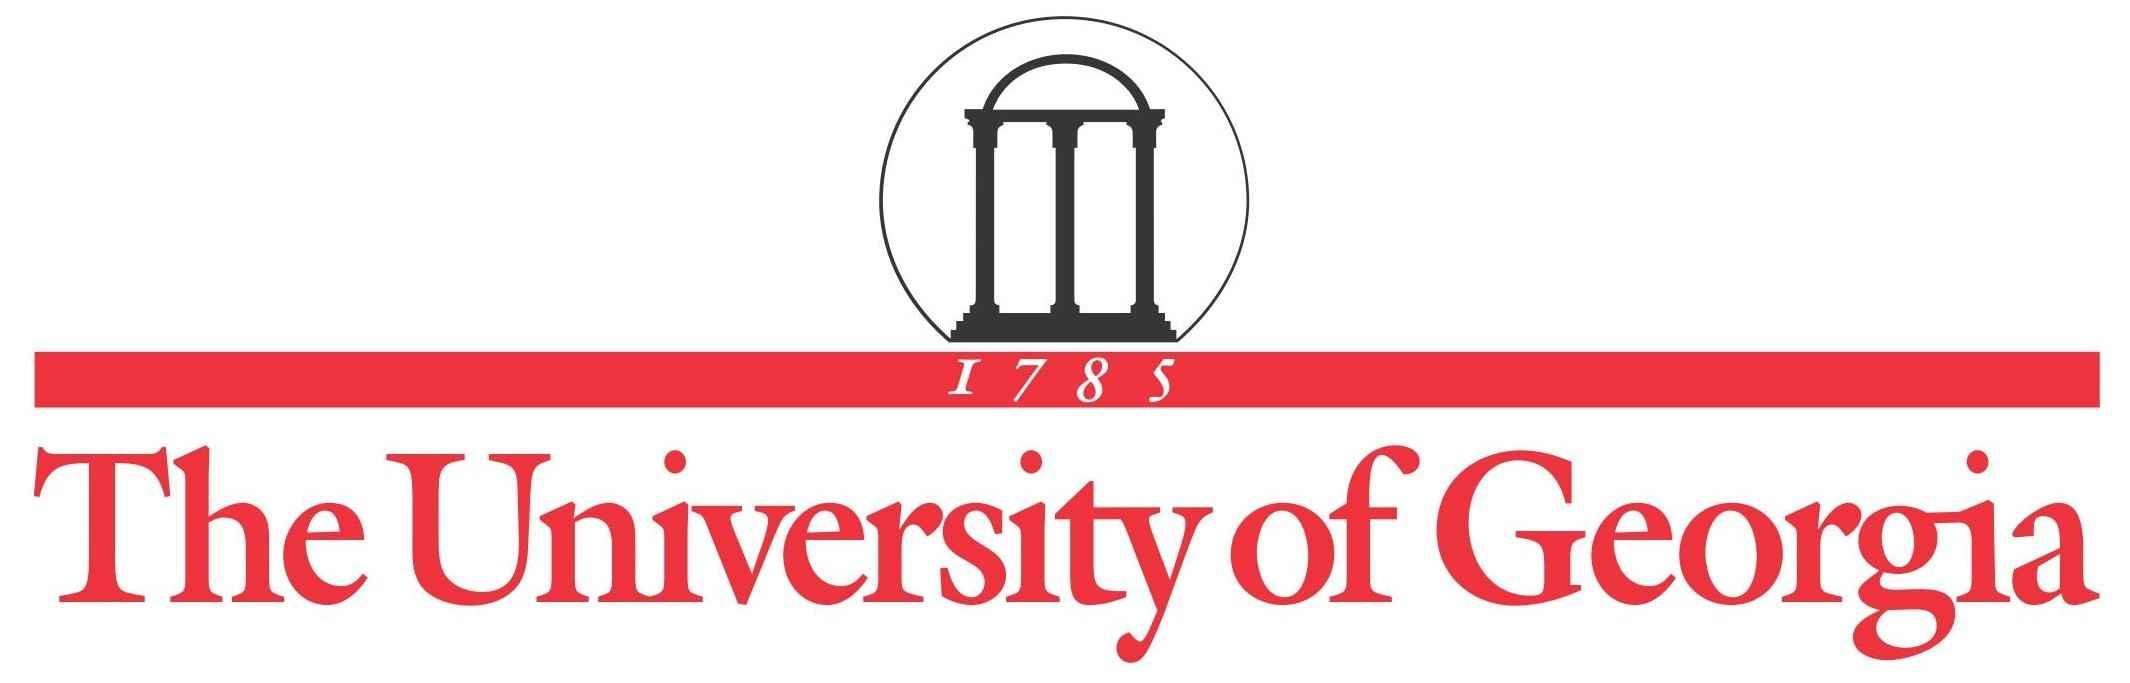 UGA   University of Georgia Logo and Seal [uga.edu] png